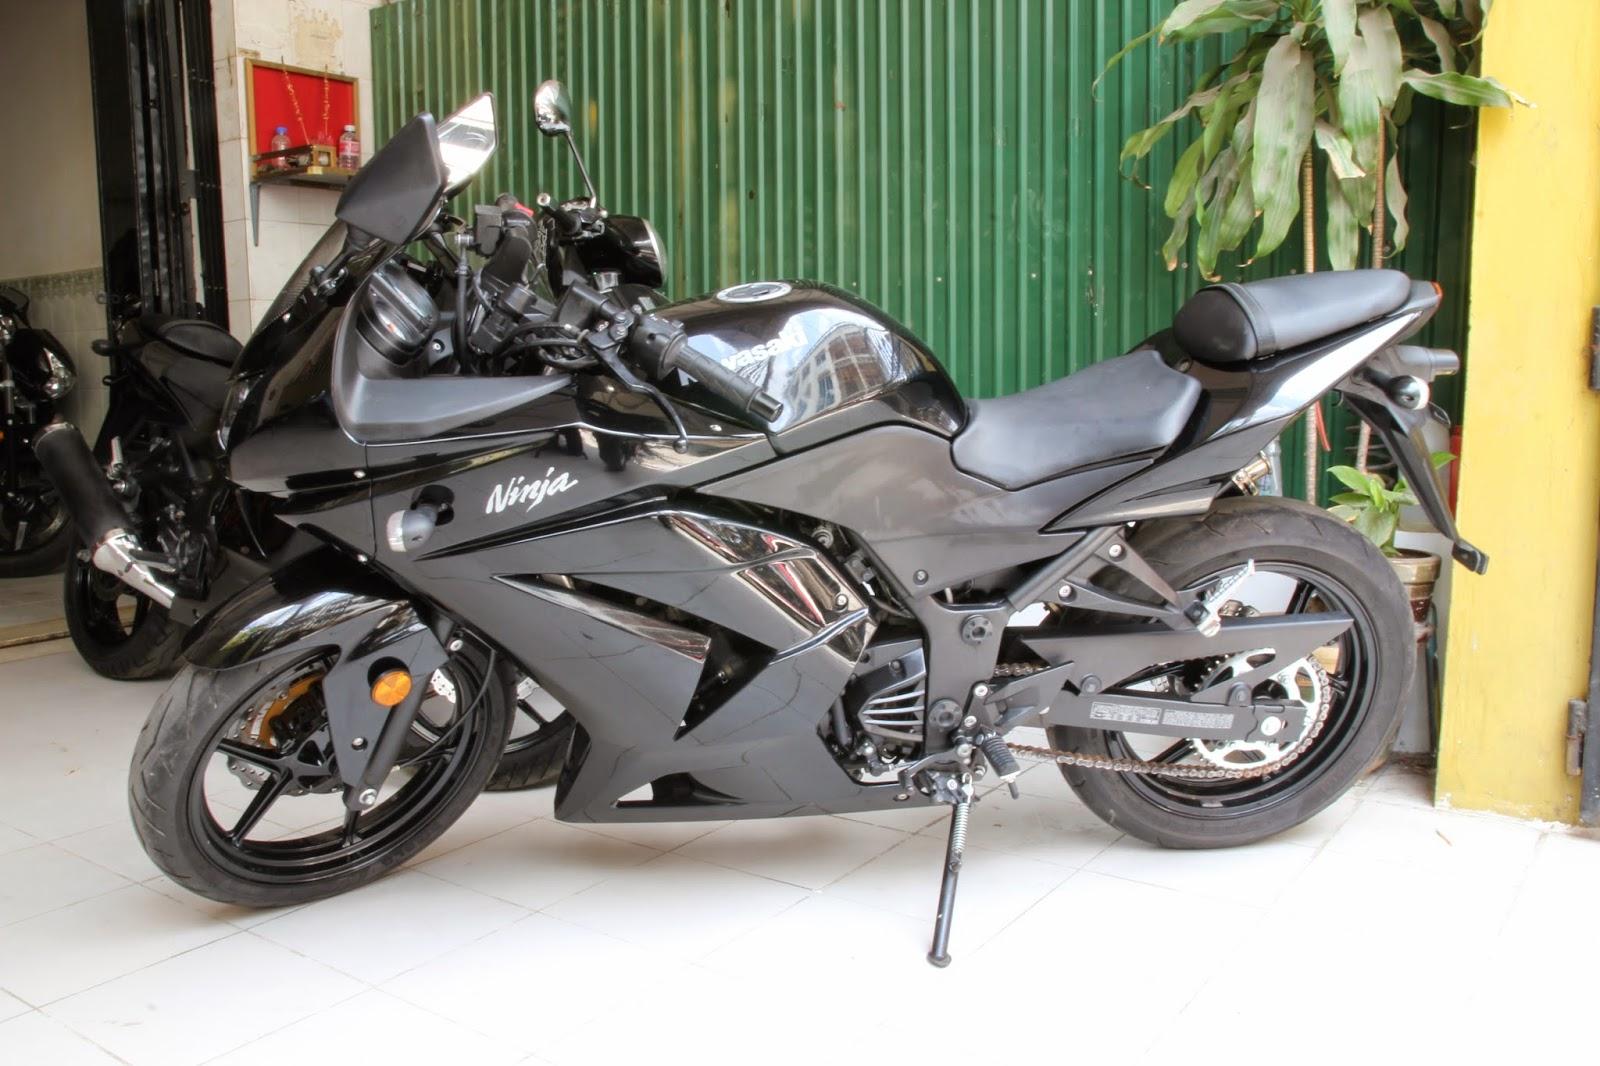 Sold, 2011 Kawasaki Ninja 250R | LuxMotor.blo.com